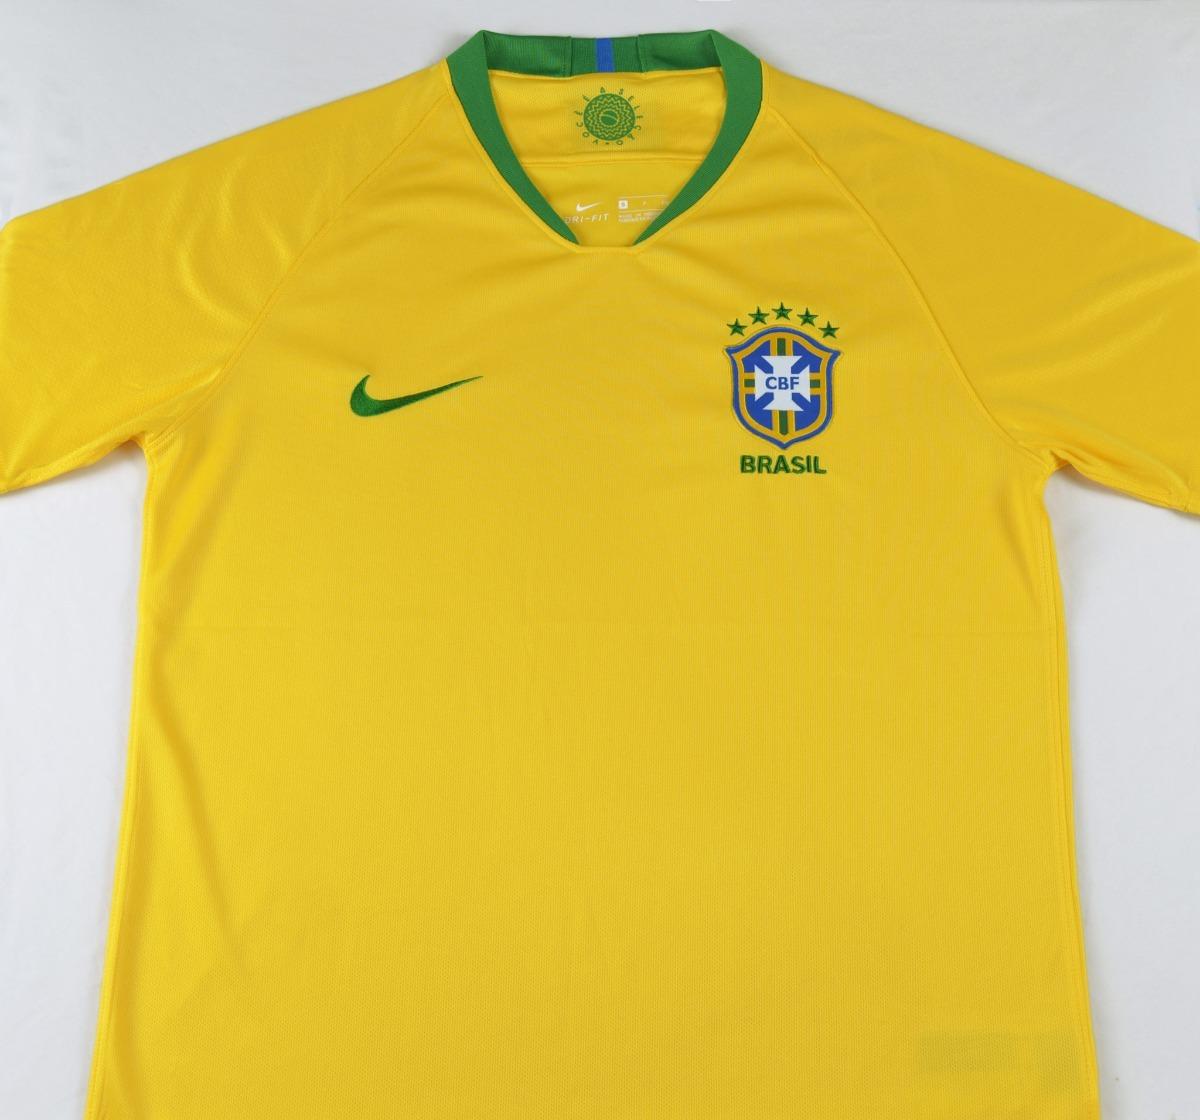 ce62b800c09e6 Camiseta Seleccion Brasil Local 2018 Neymar Jr Mundial -   159.900 ...